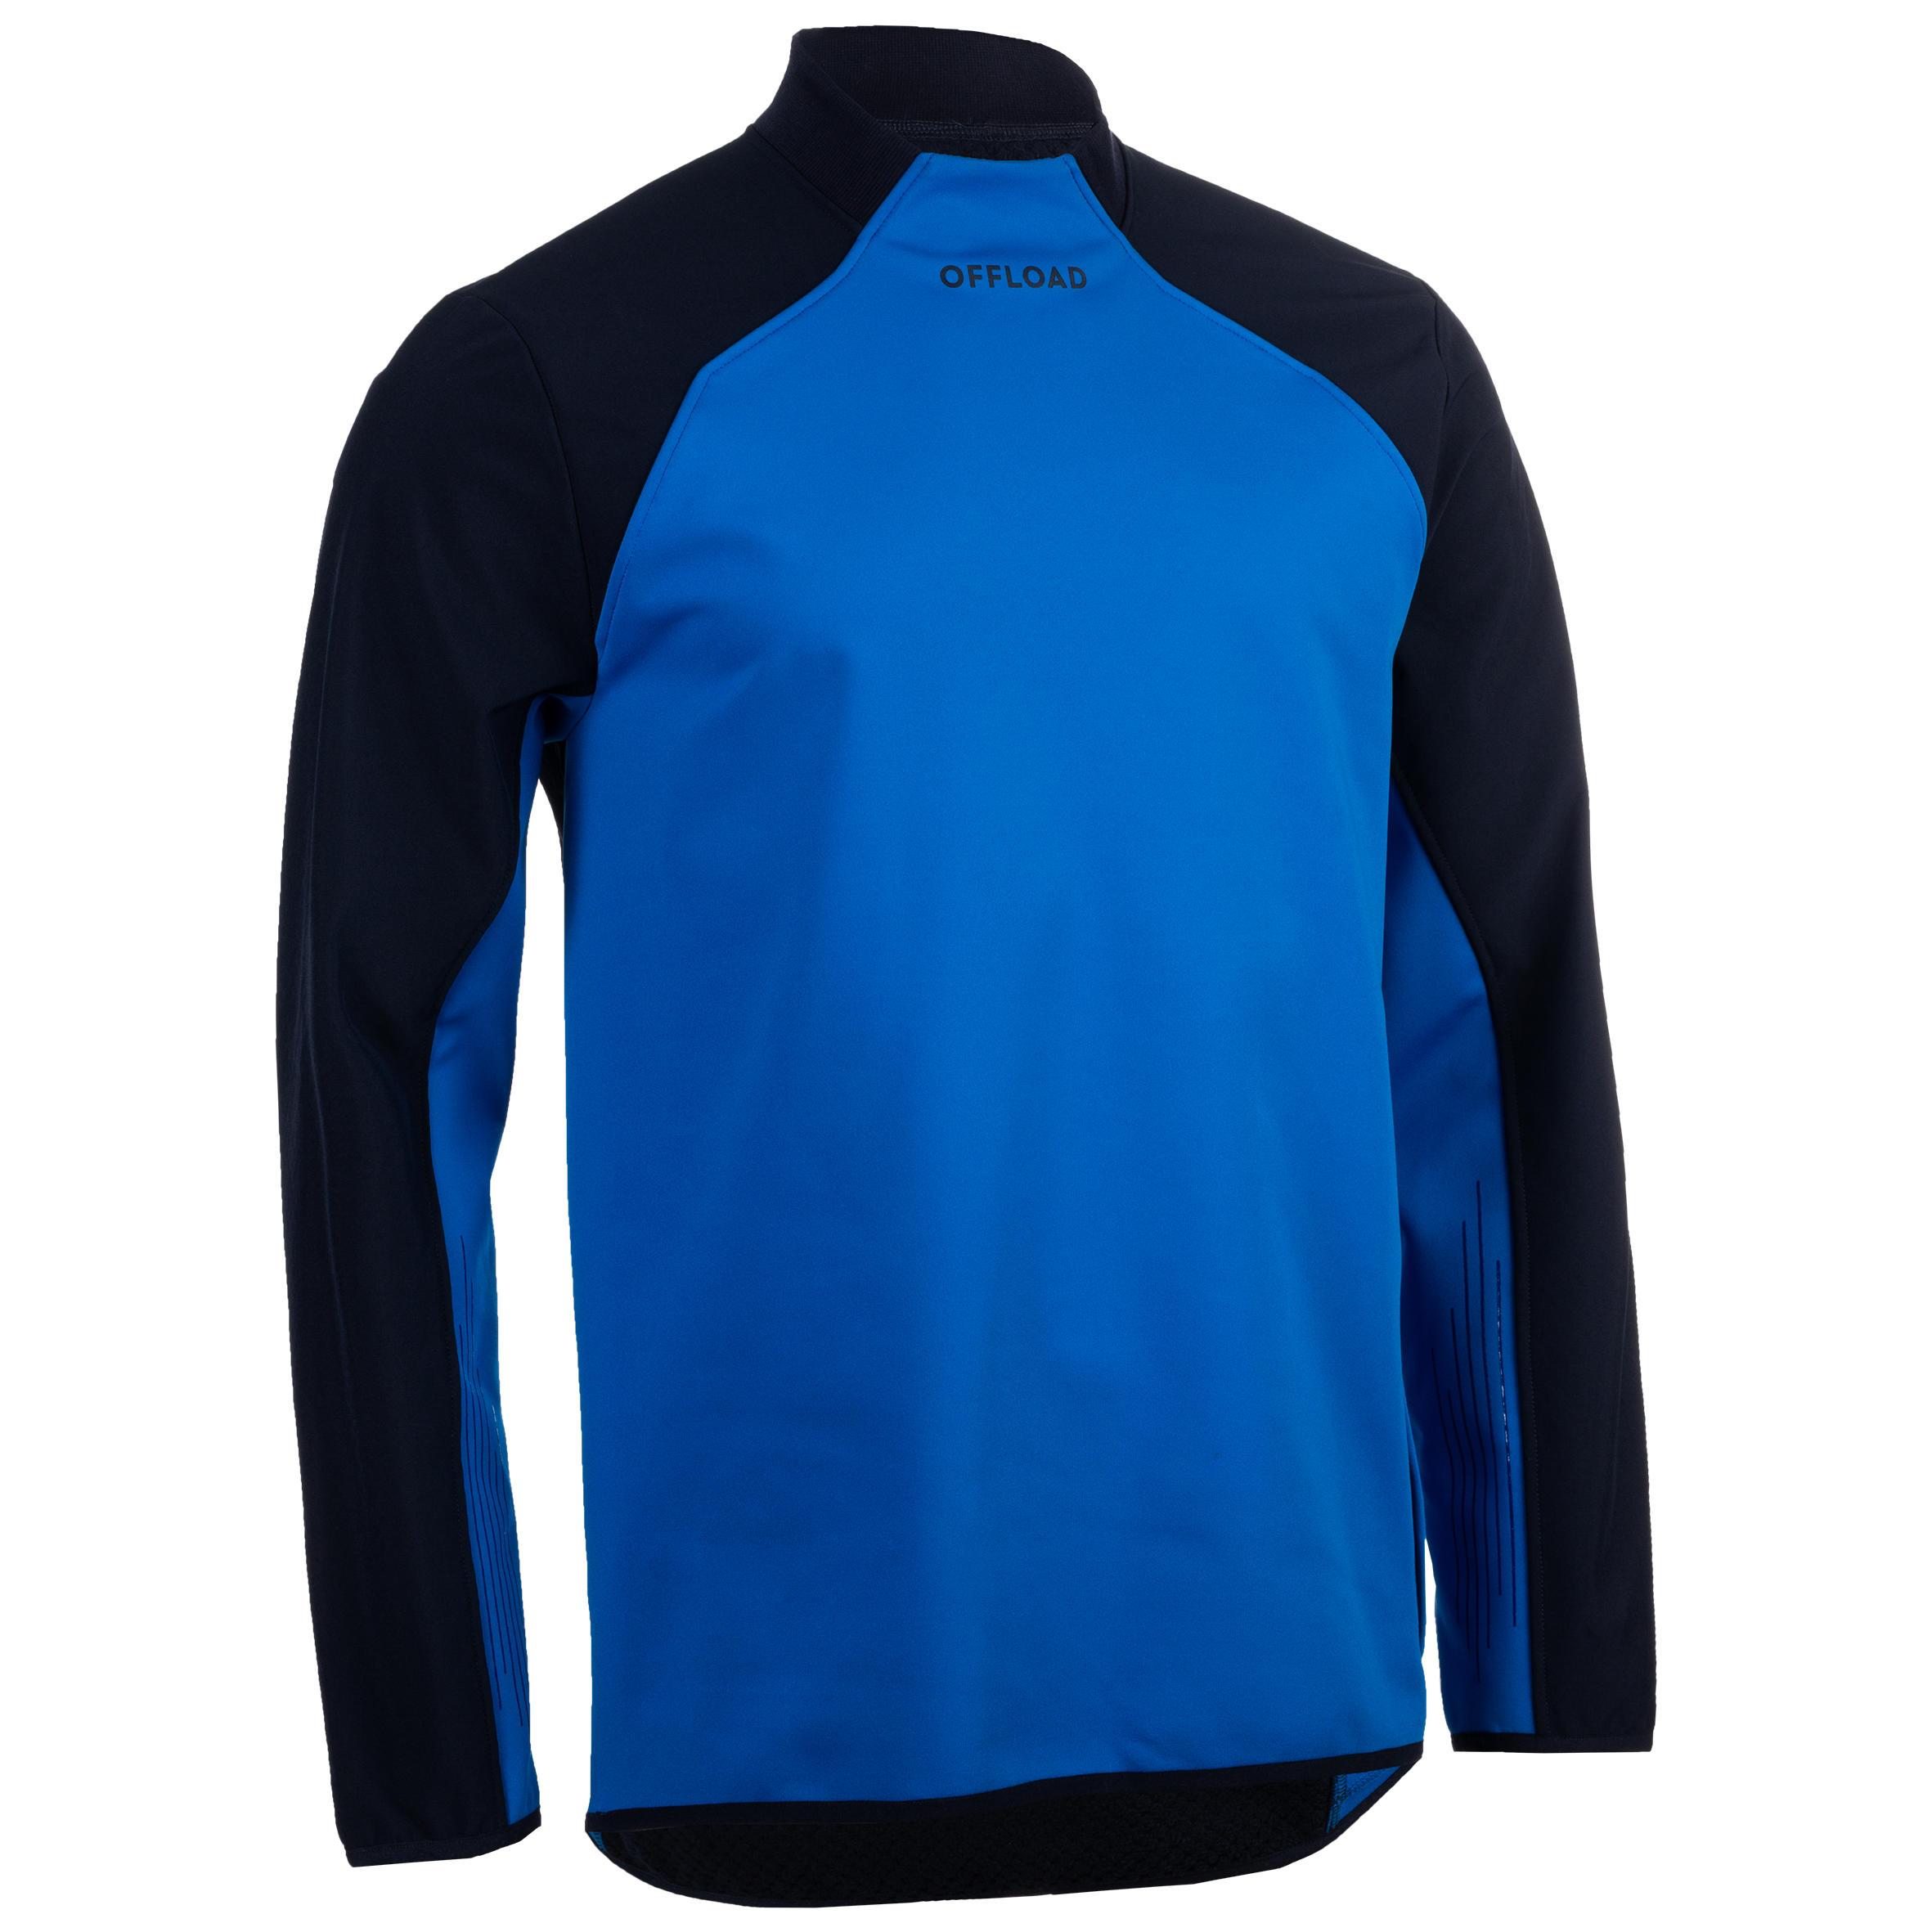 Sweatshirt Training Rugby R500 Erwachsene blau | Sportbekleidung > Fleecepullover | Offload